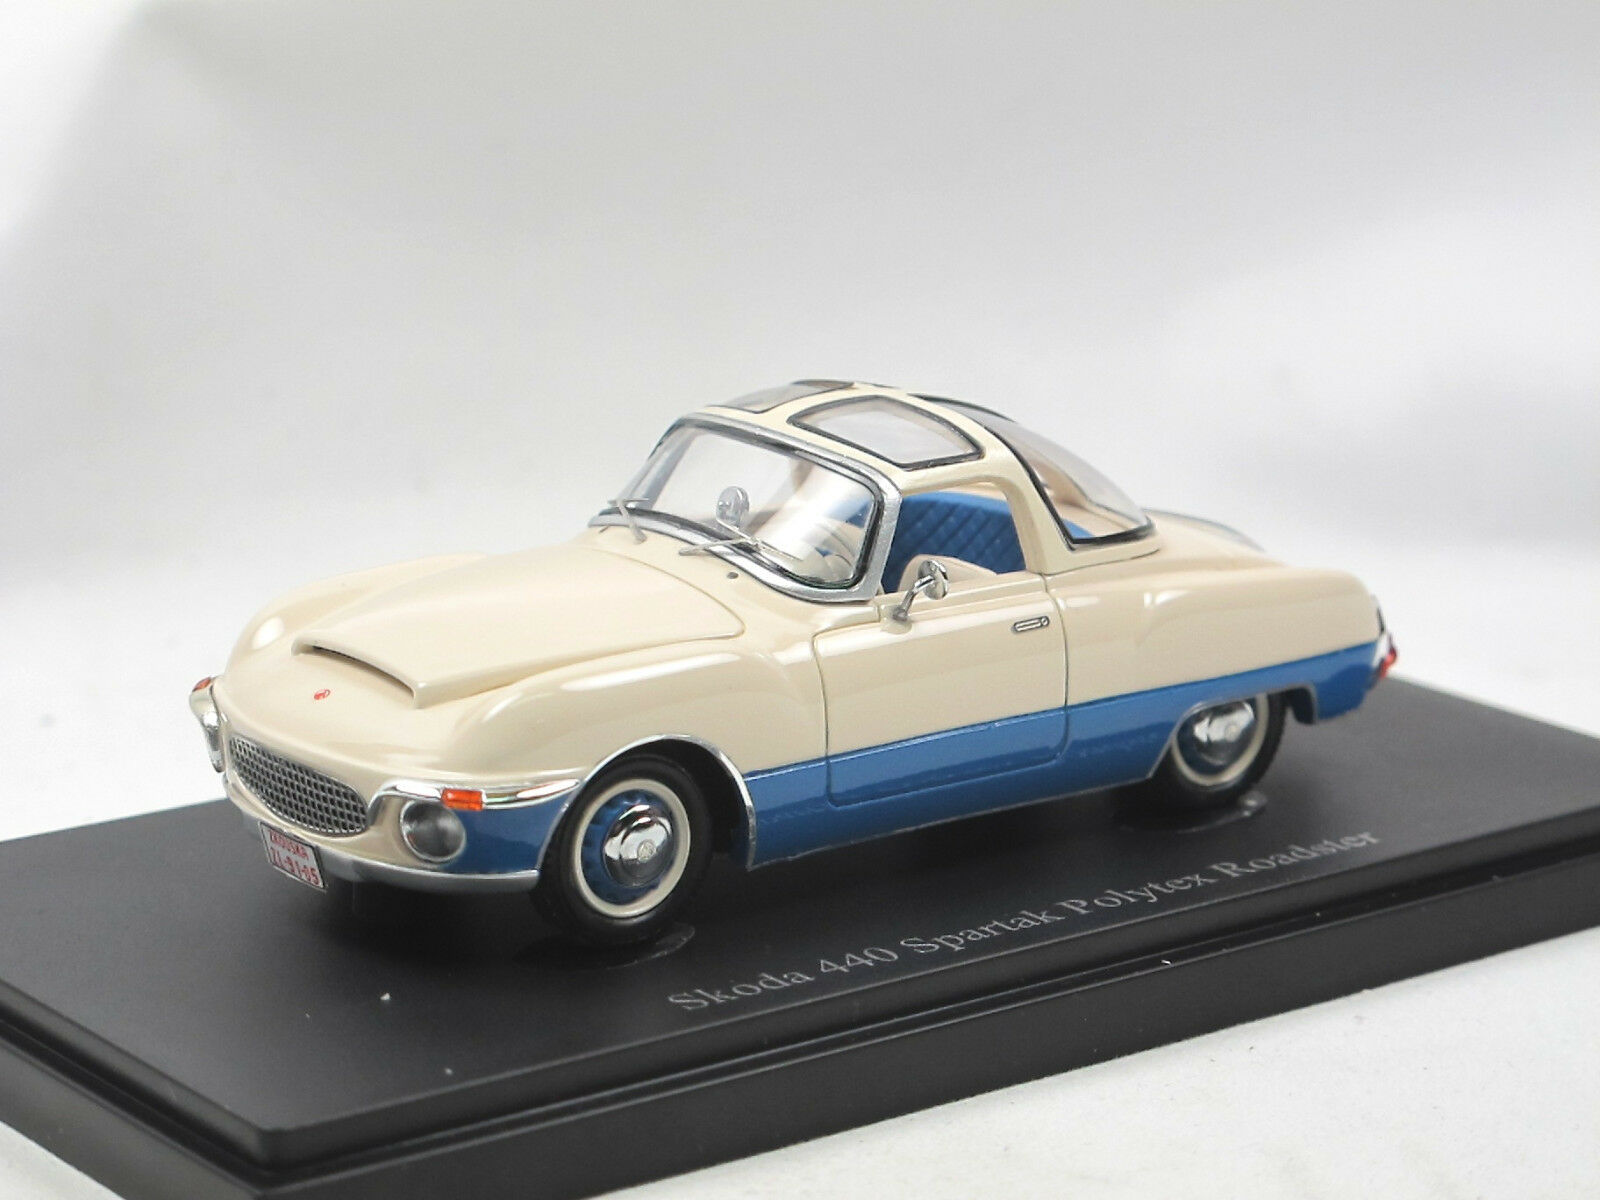 Autocult 06028 - 1956 SKODA 440 Spartak Polytex Roadster Prougeotype CZ 1 43